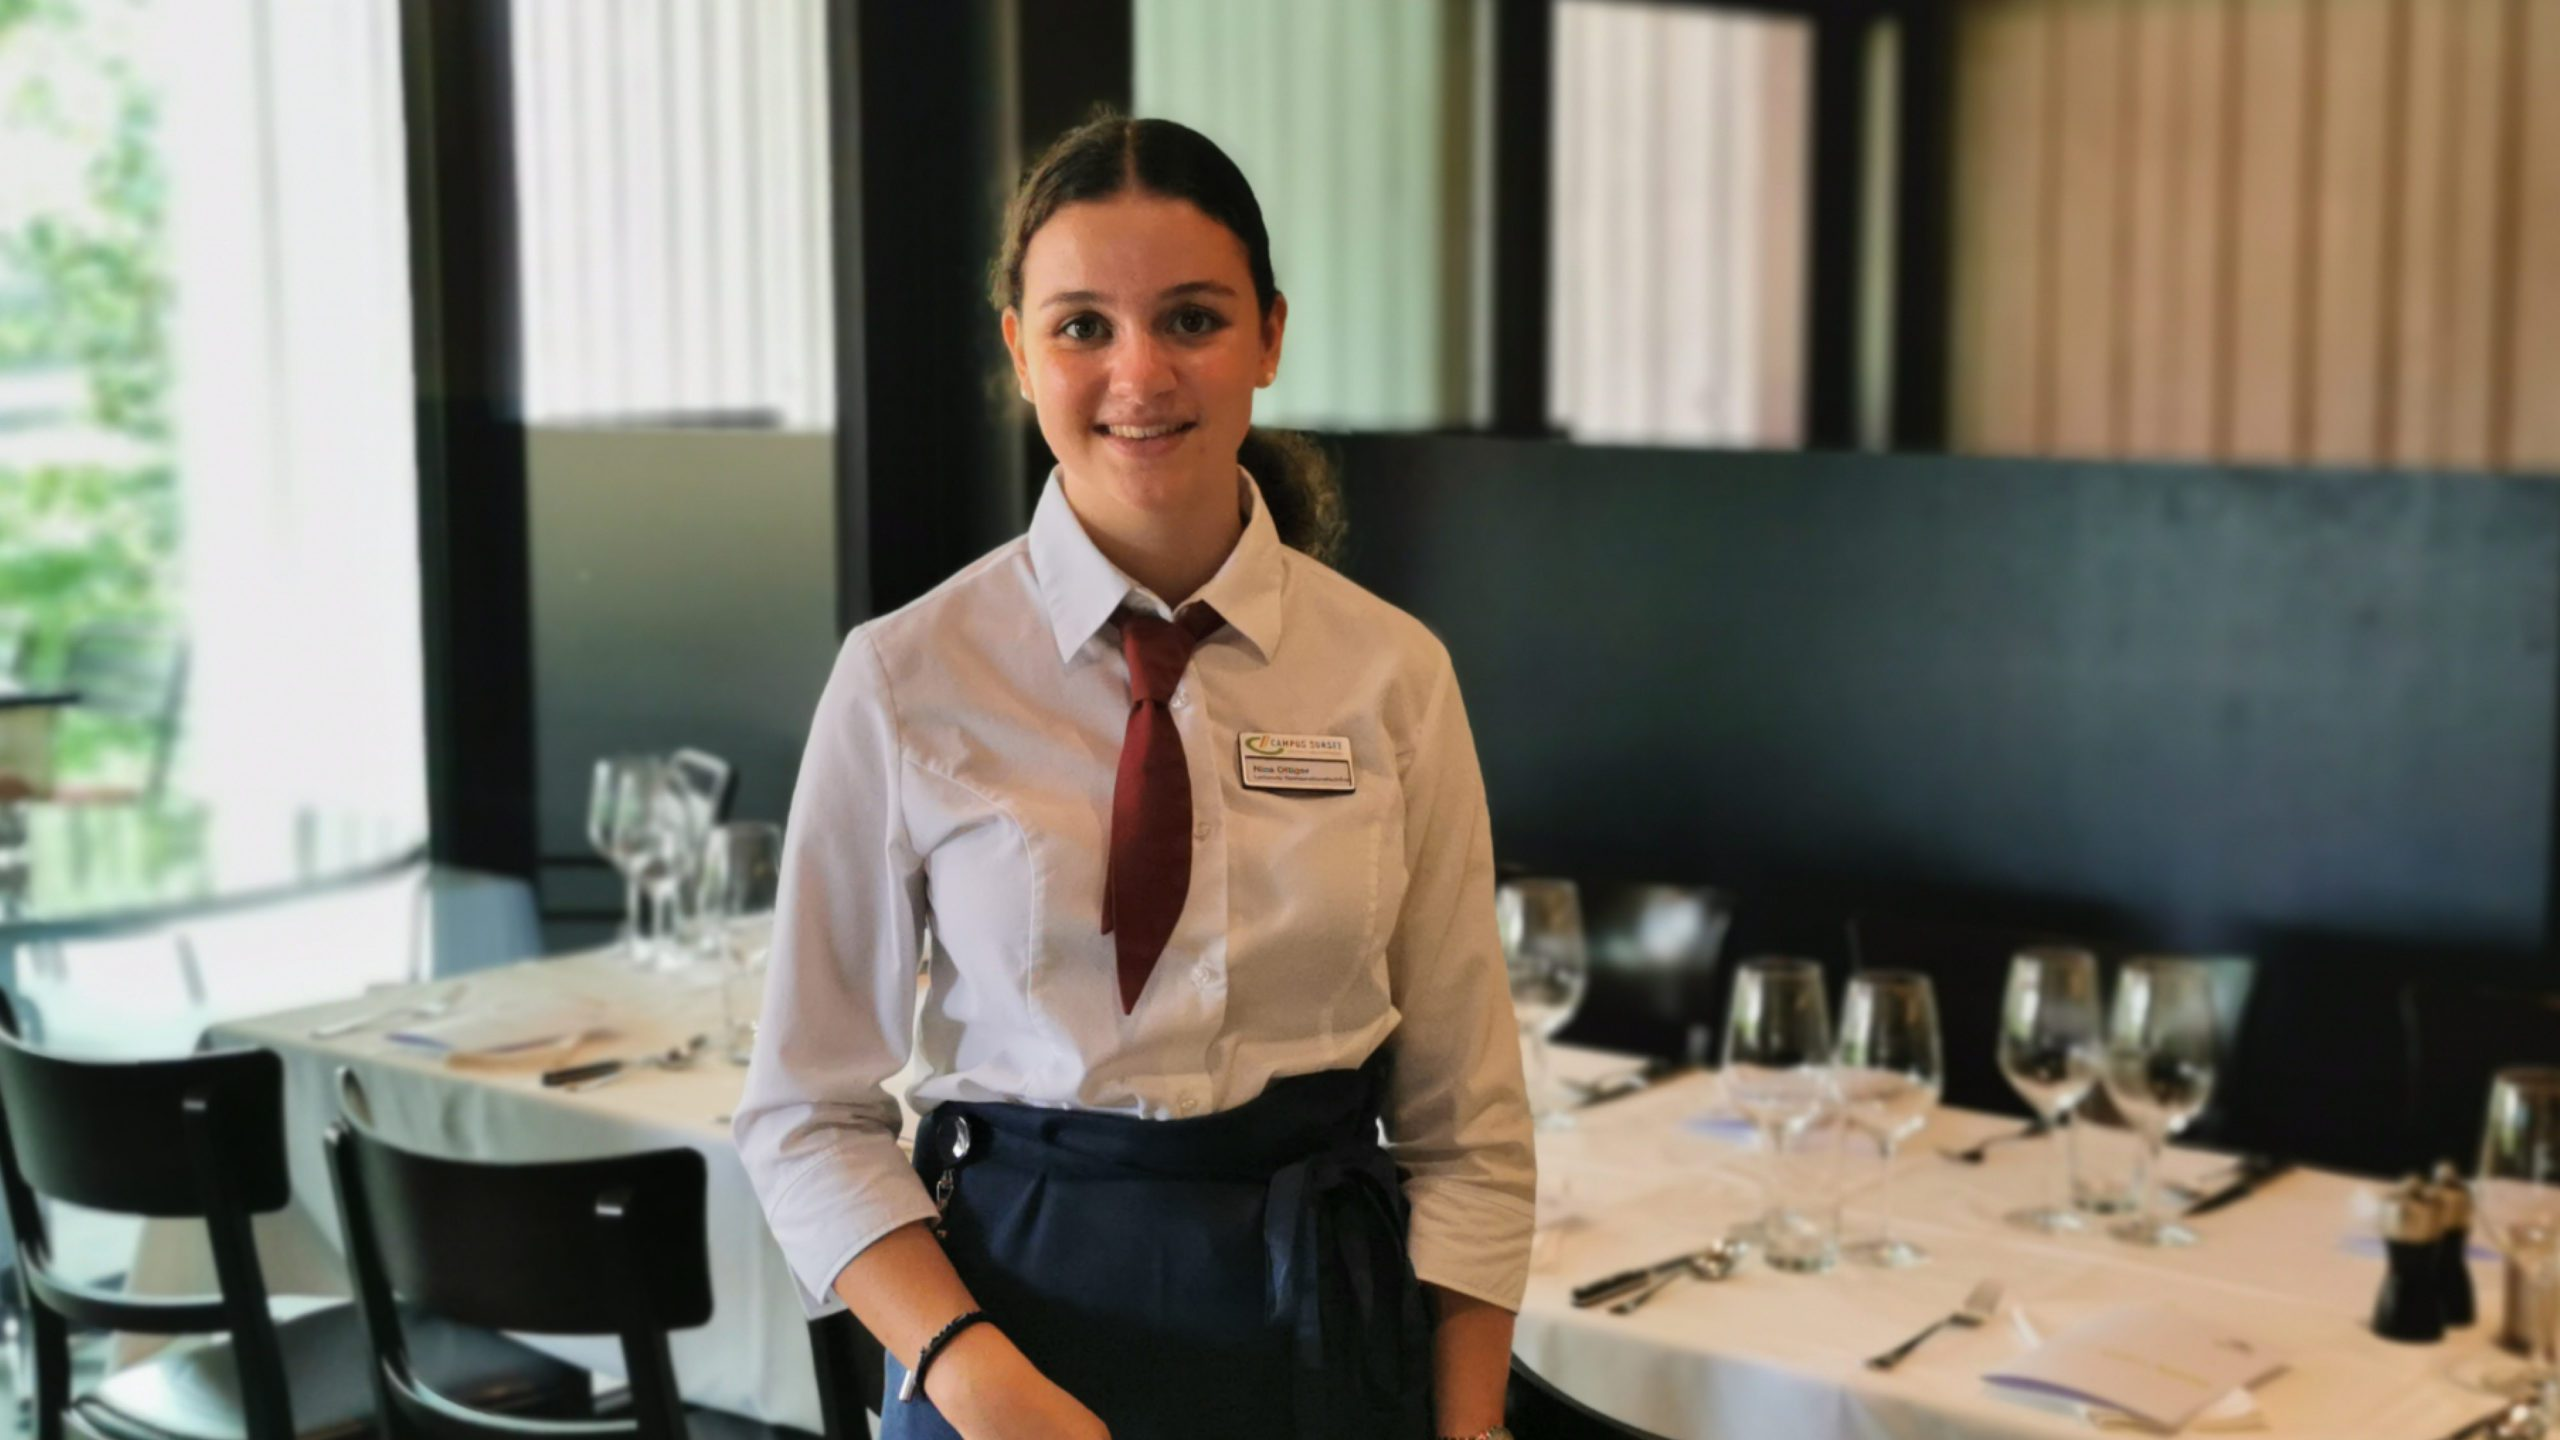 Nina Ottiger, Lernende Restaurationsfachfrau